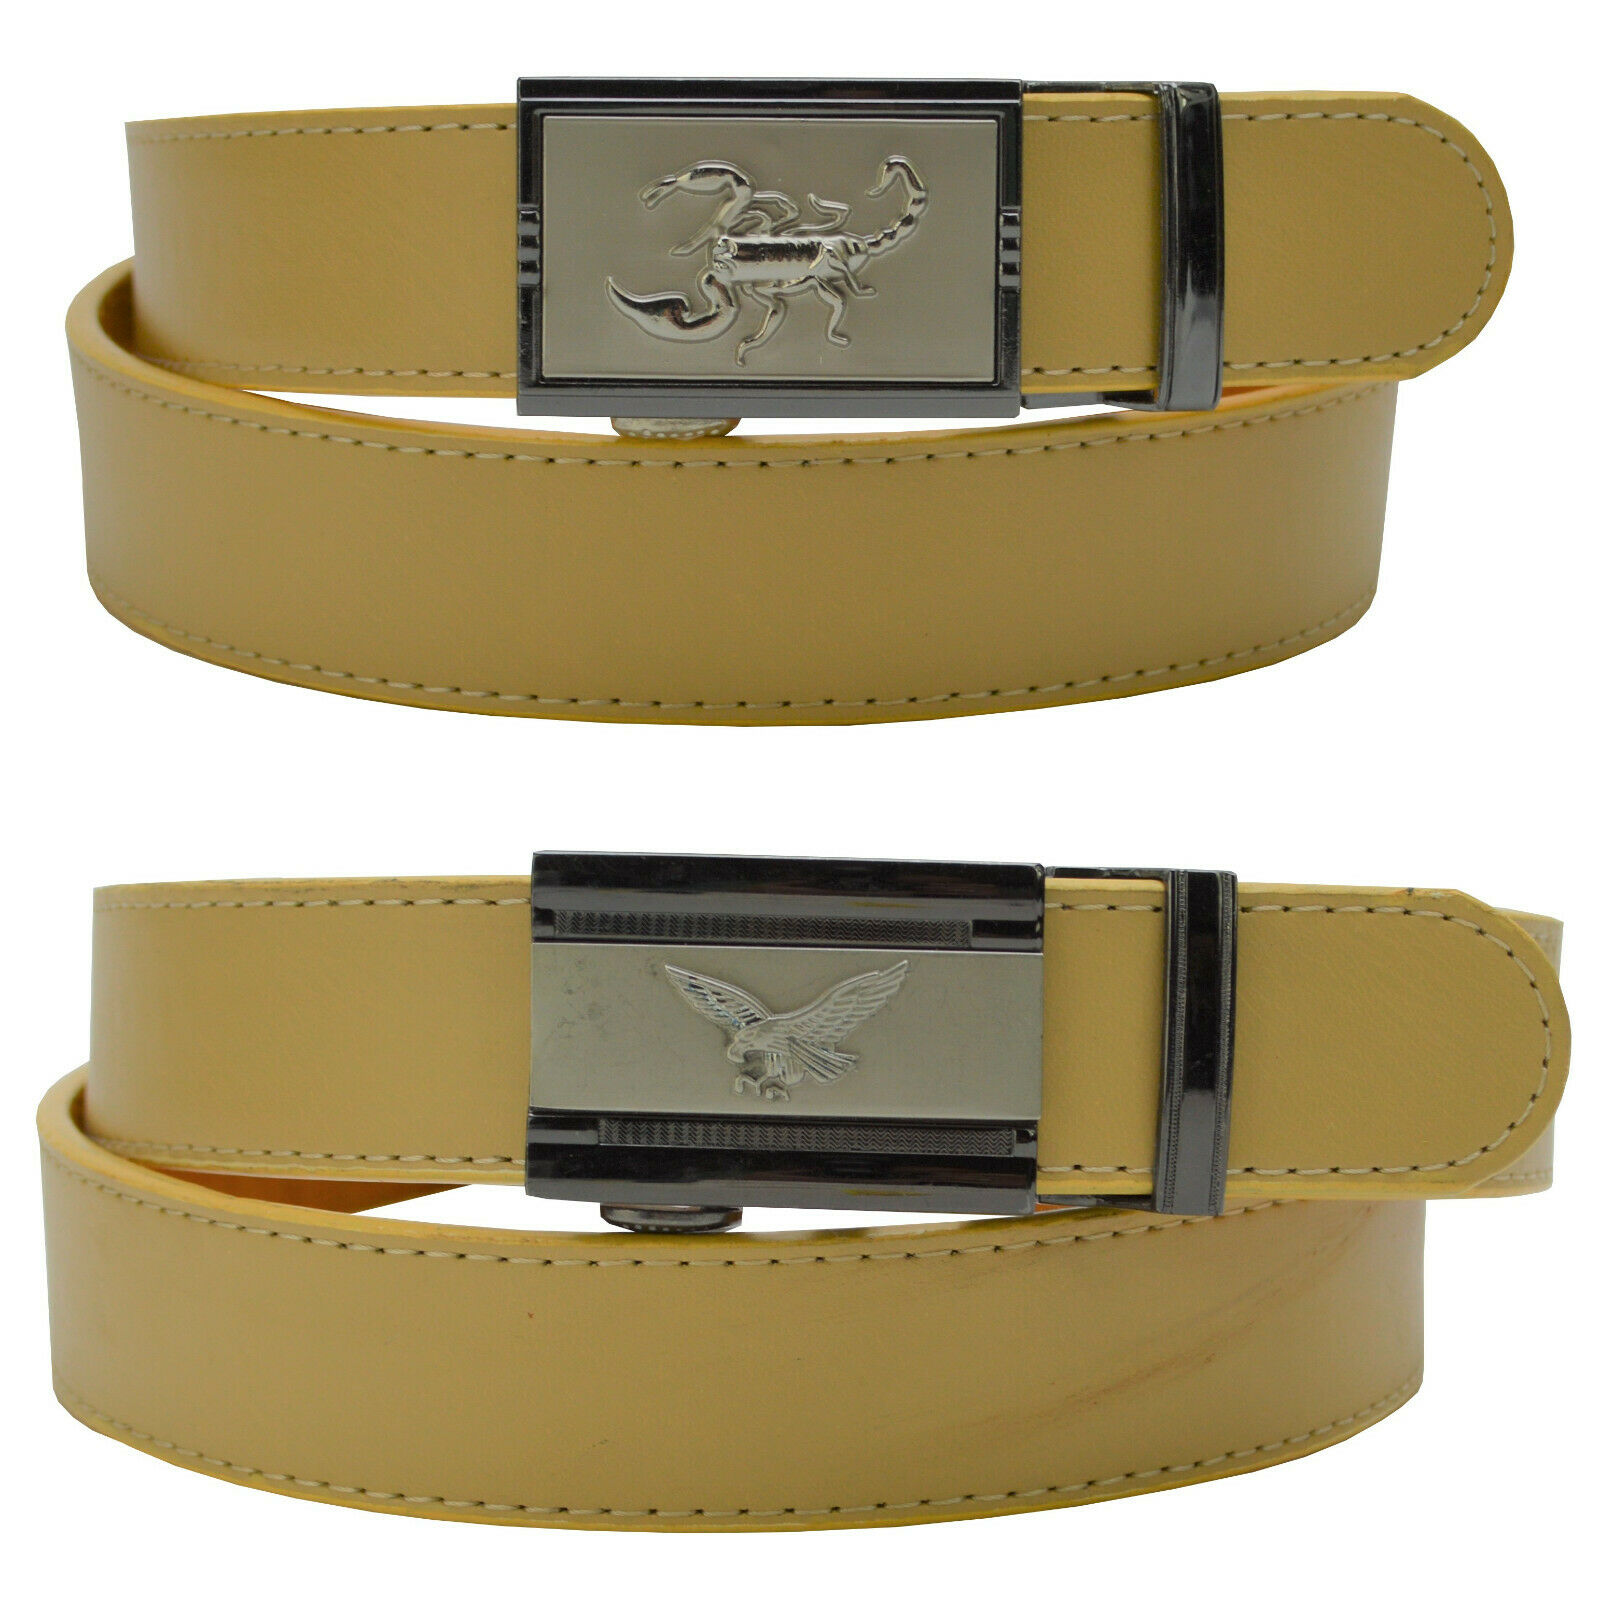 2er Set Men's Automatic Belt 105 - 125 cm beige 3,0 B-Ware with Buckle